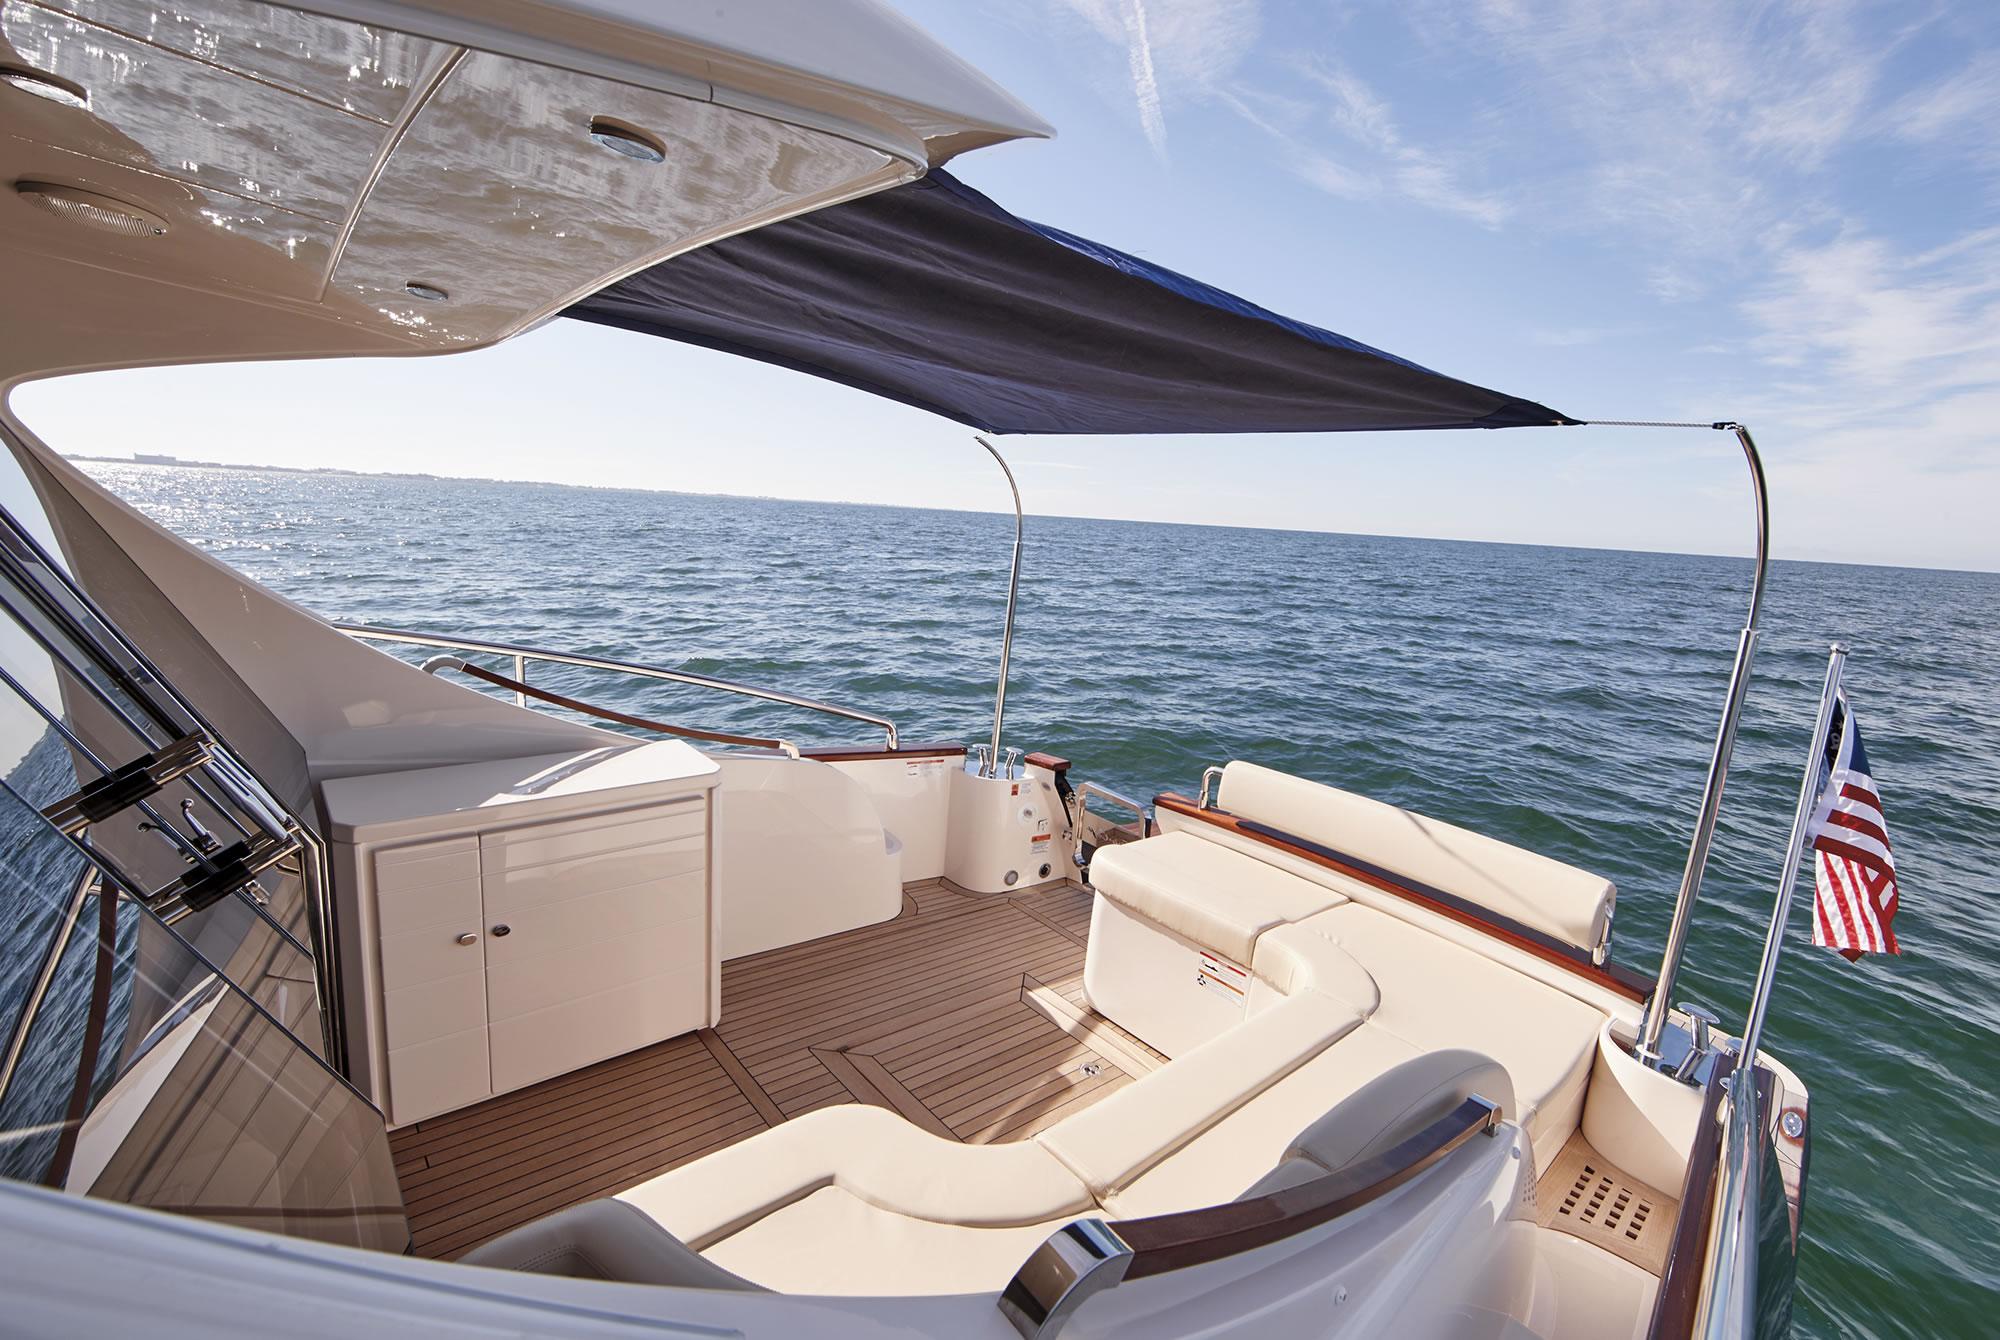 hight resolution of inshore yachts chris craft commander 44 golfe juan c te d azur